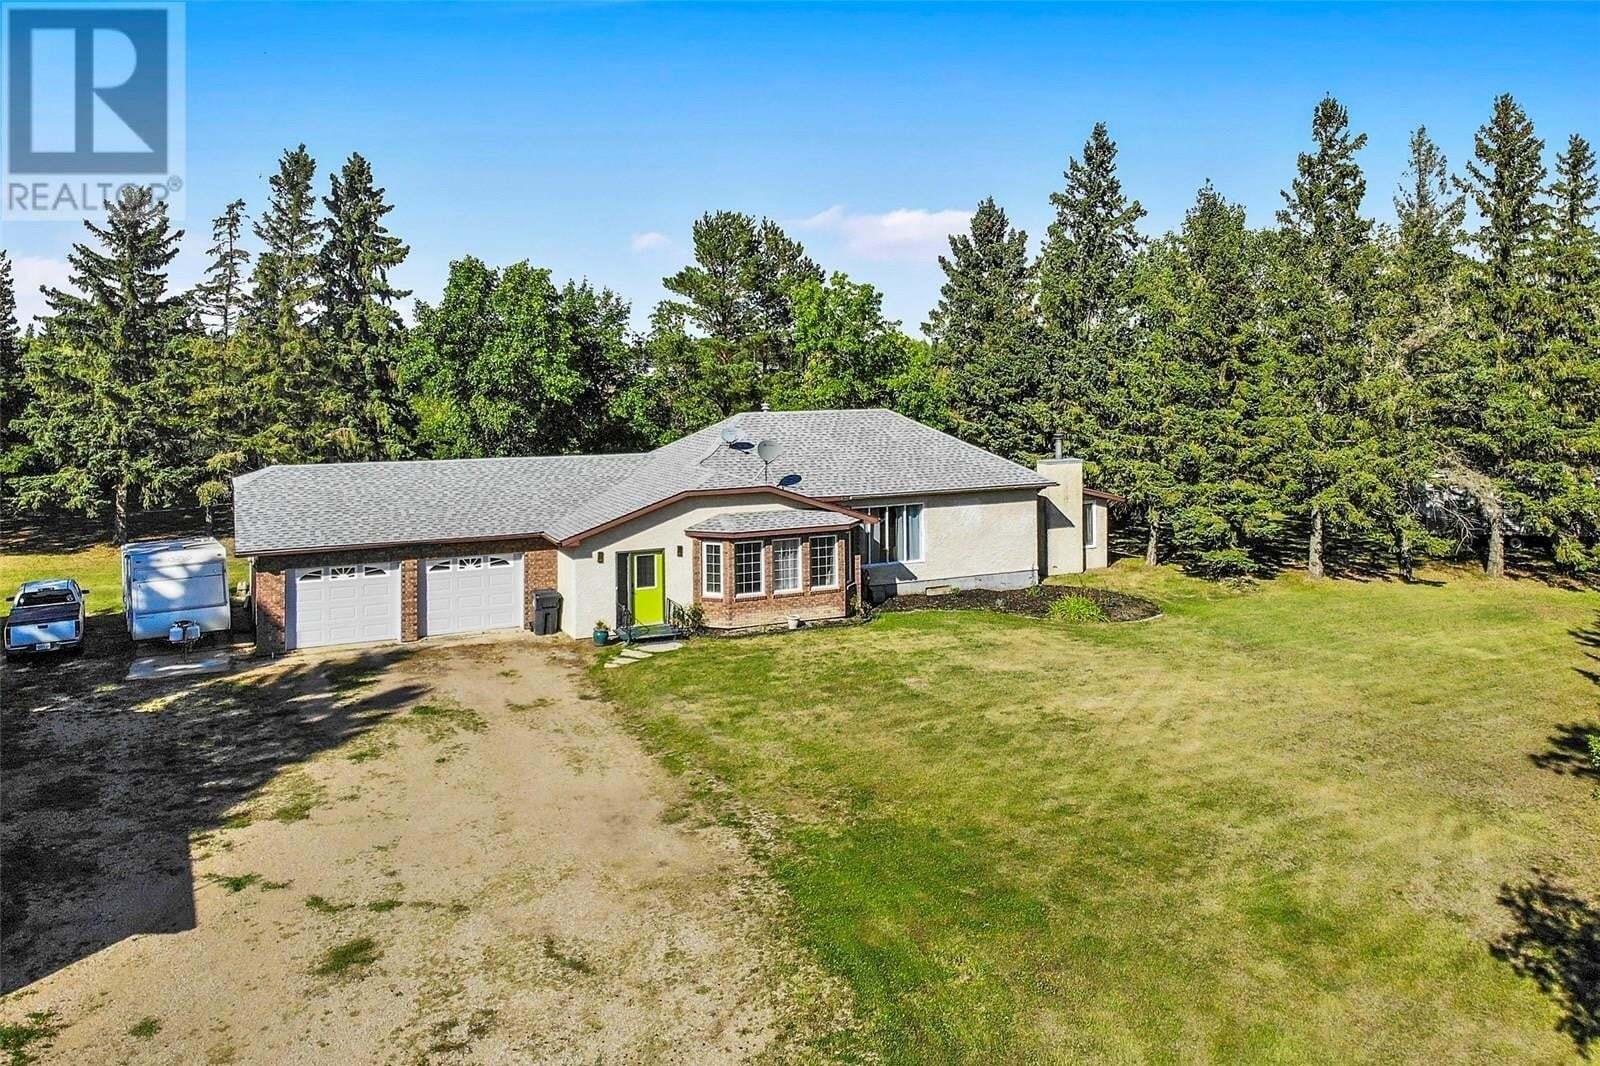 House for sale at 312 2nd Ave E Waldheim Saskatchewan - MLS: SK826042